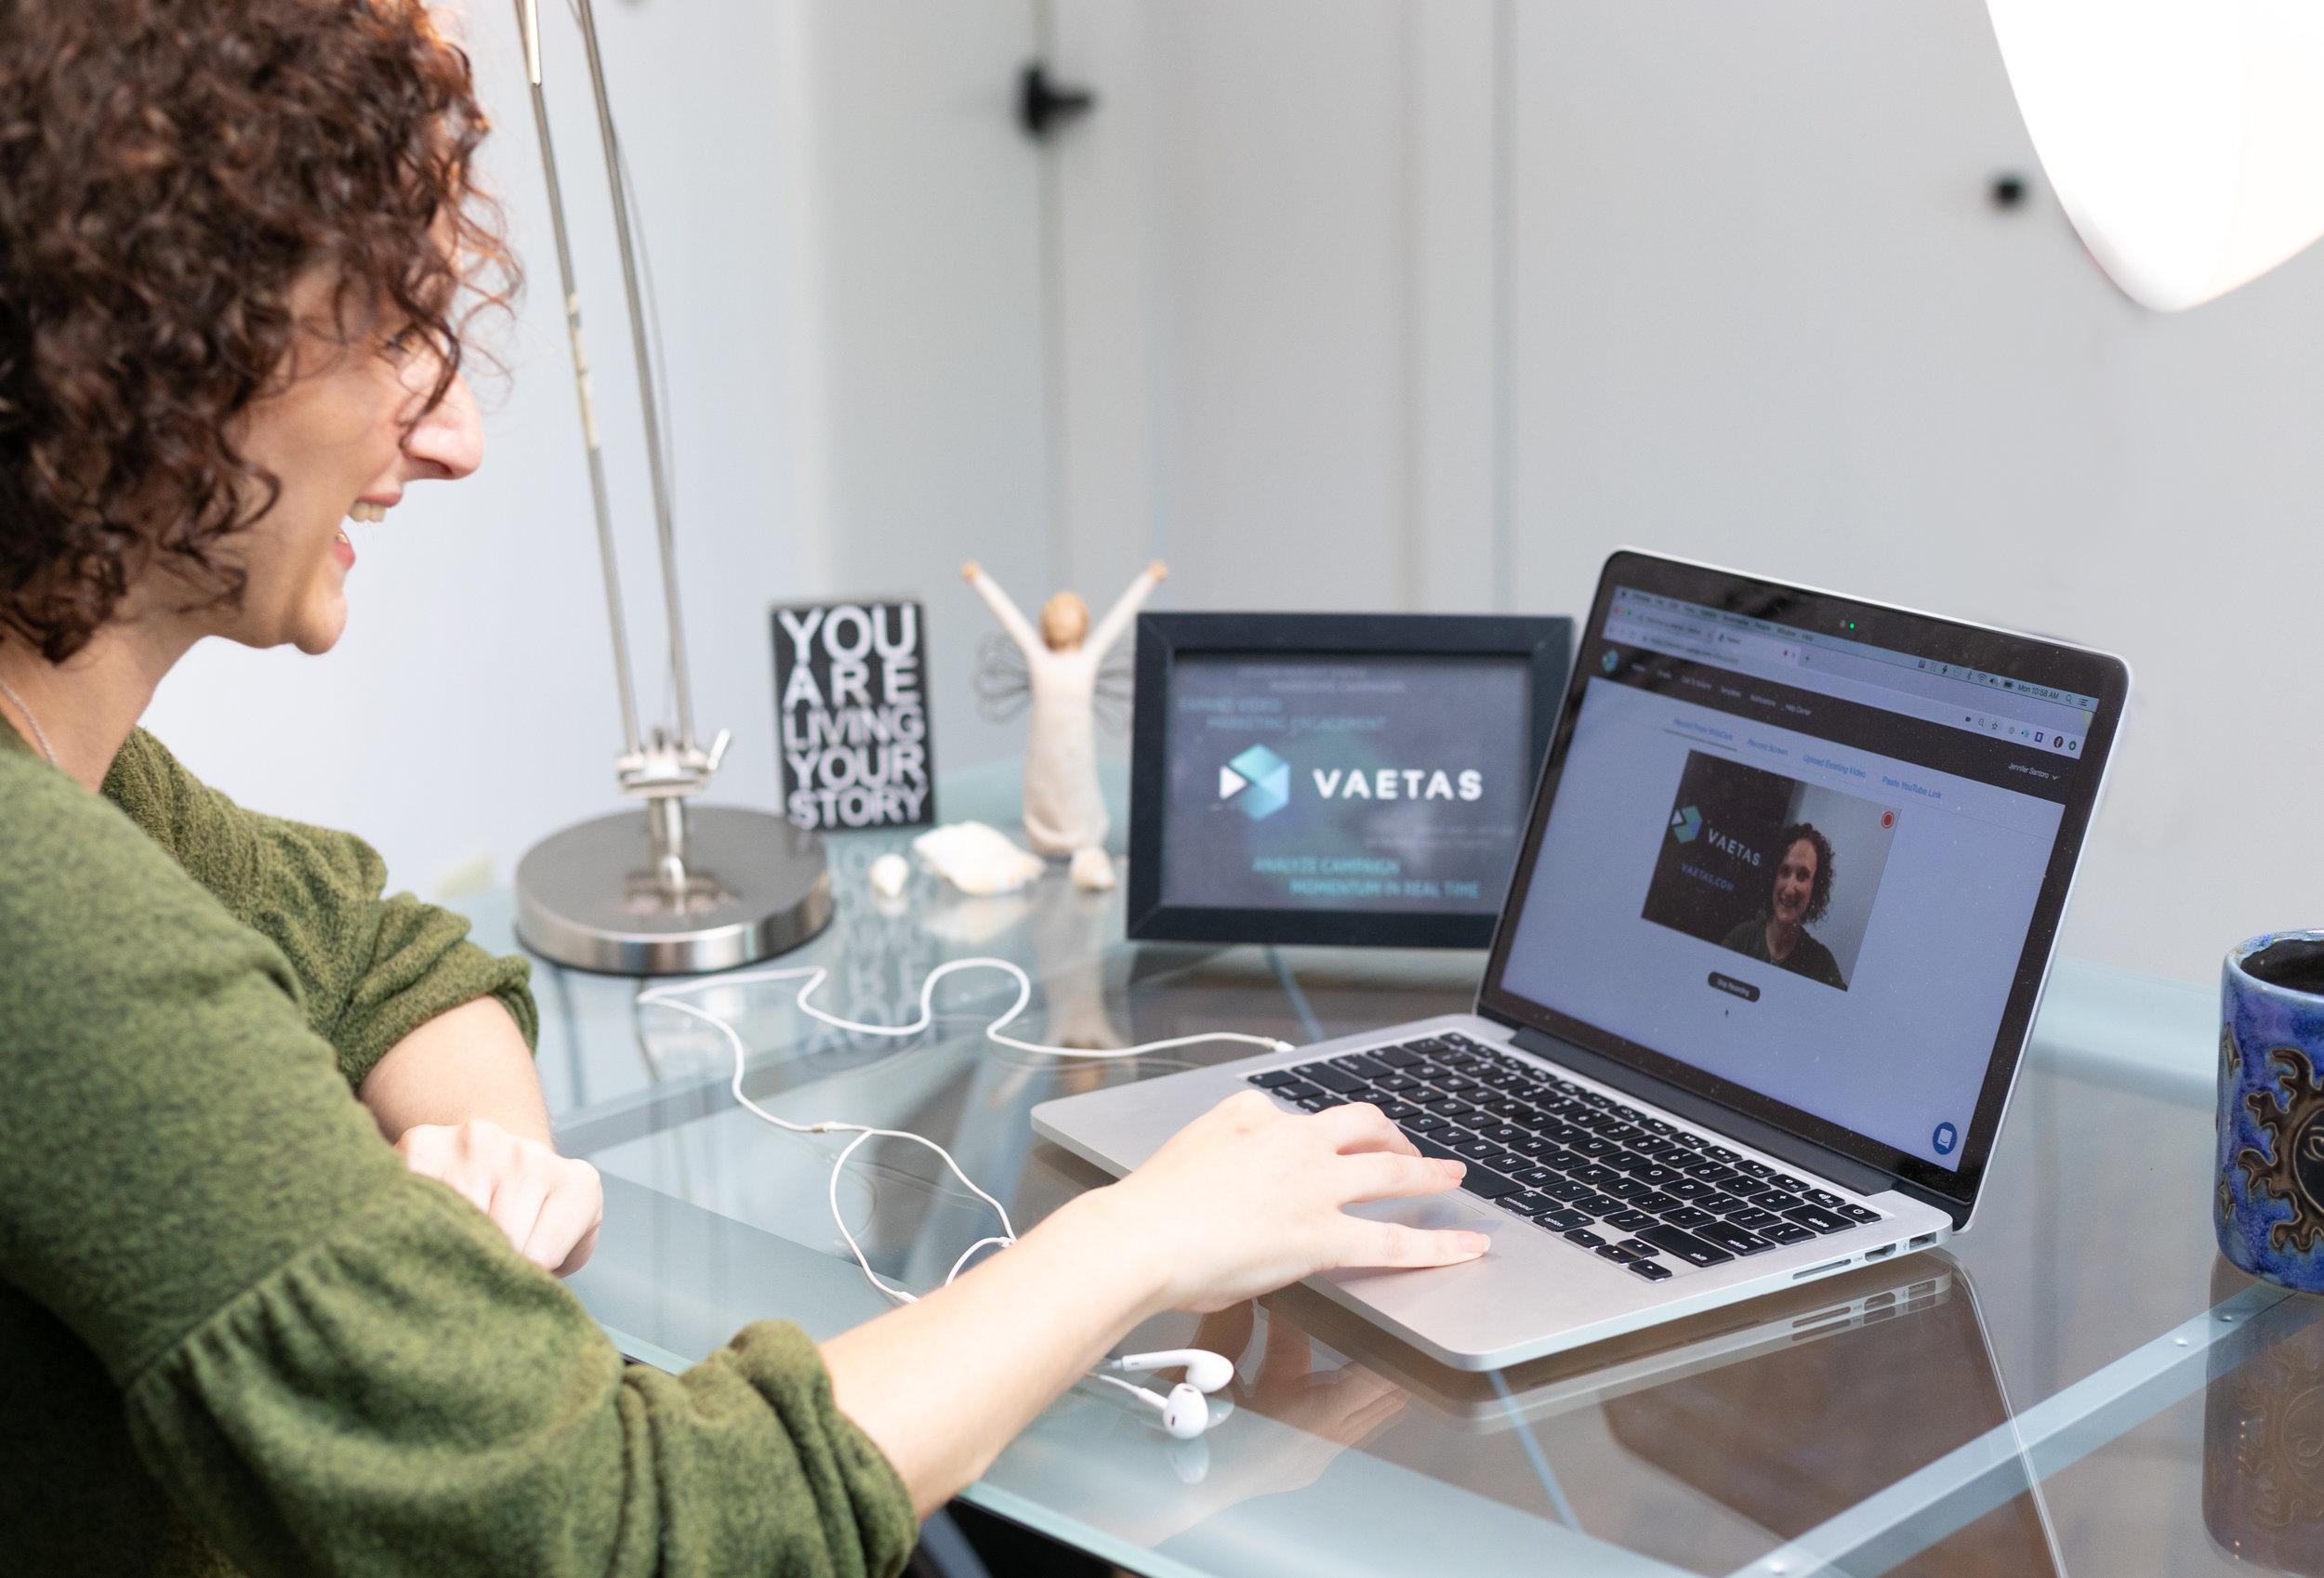 Vaetas - Video Technology Company